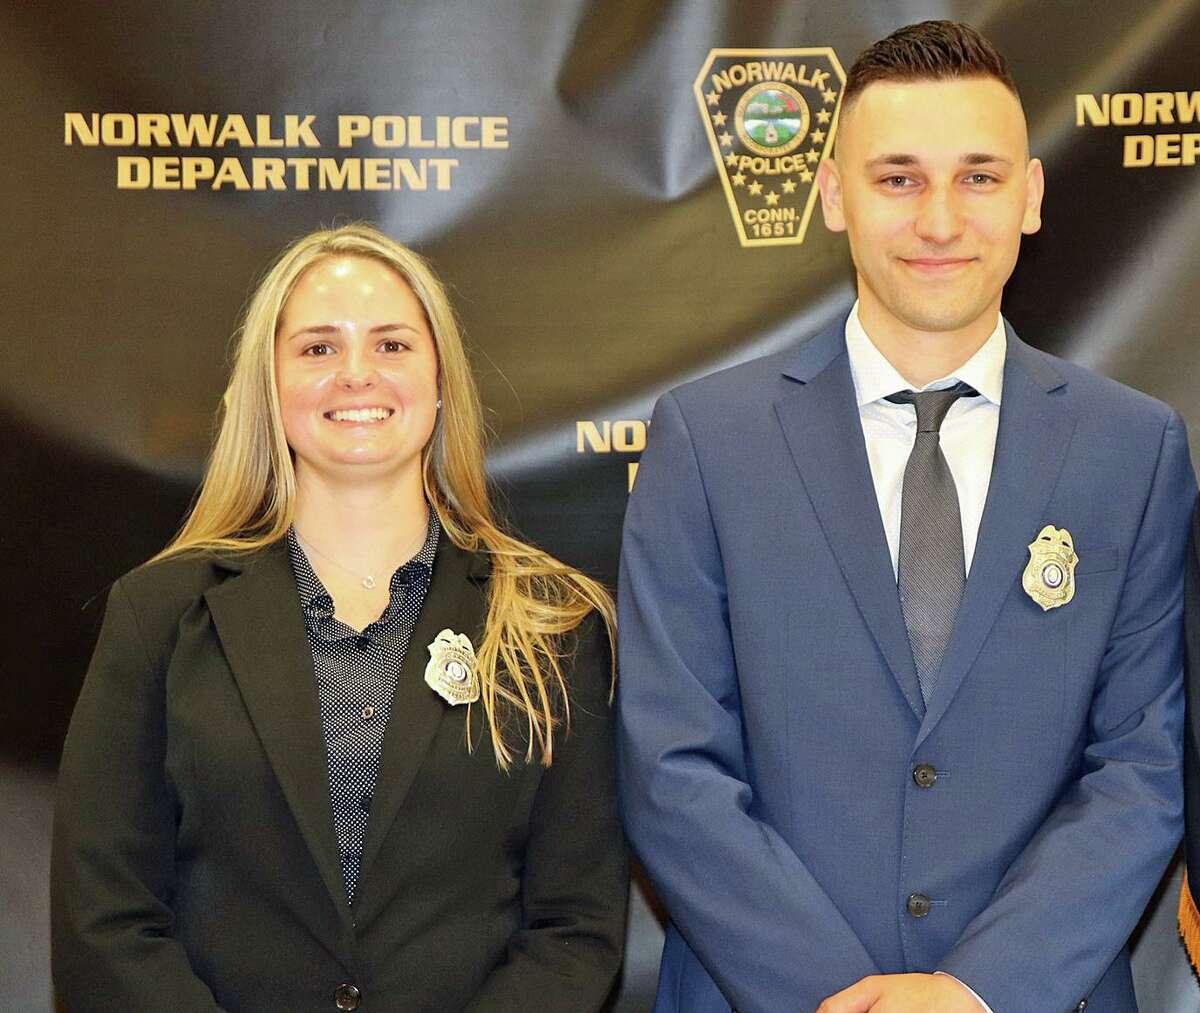 Chealsey Ortiz (left) and Mario Pecirep are former Bridgeport police officers.